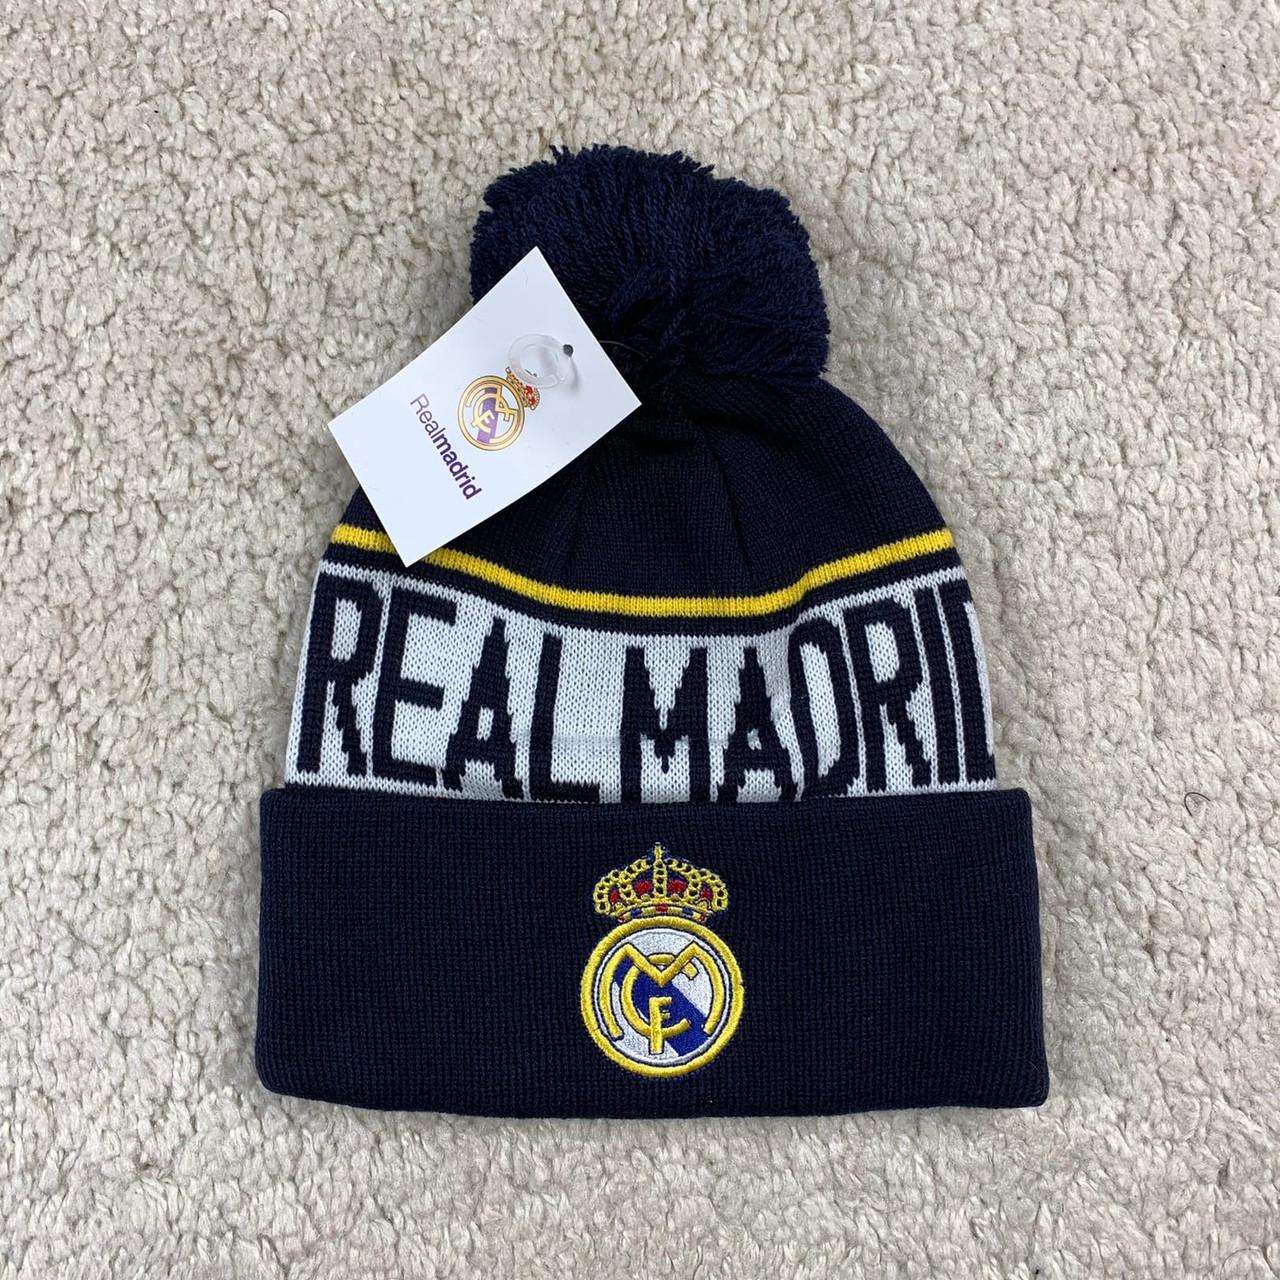 Зимова шапка Реал Мадрид чорна